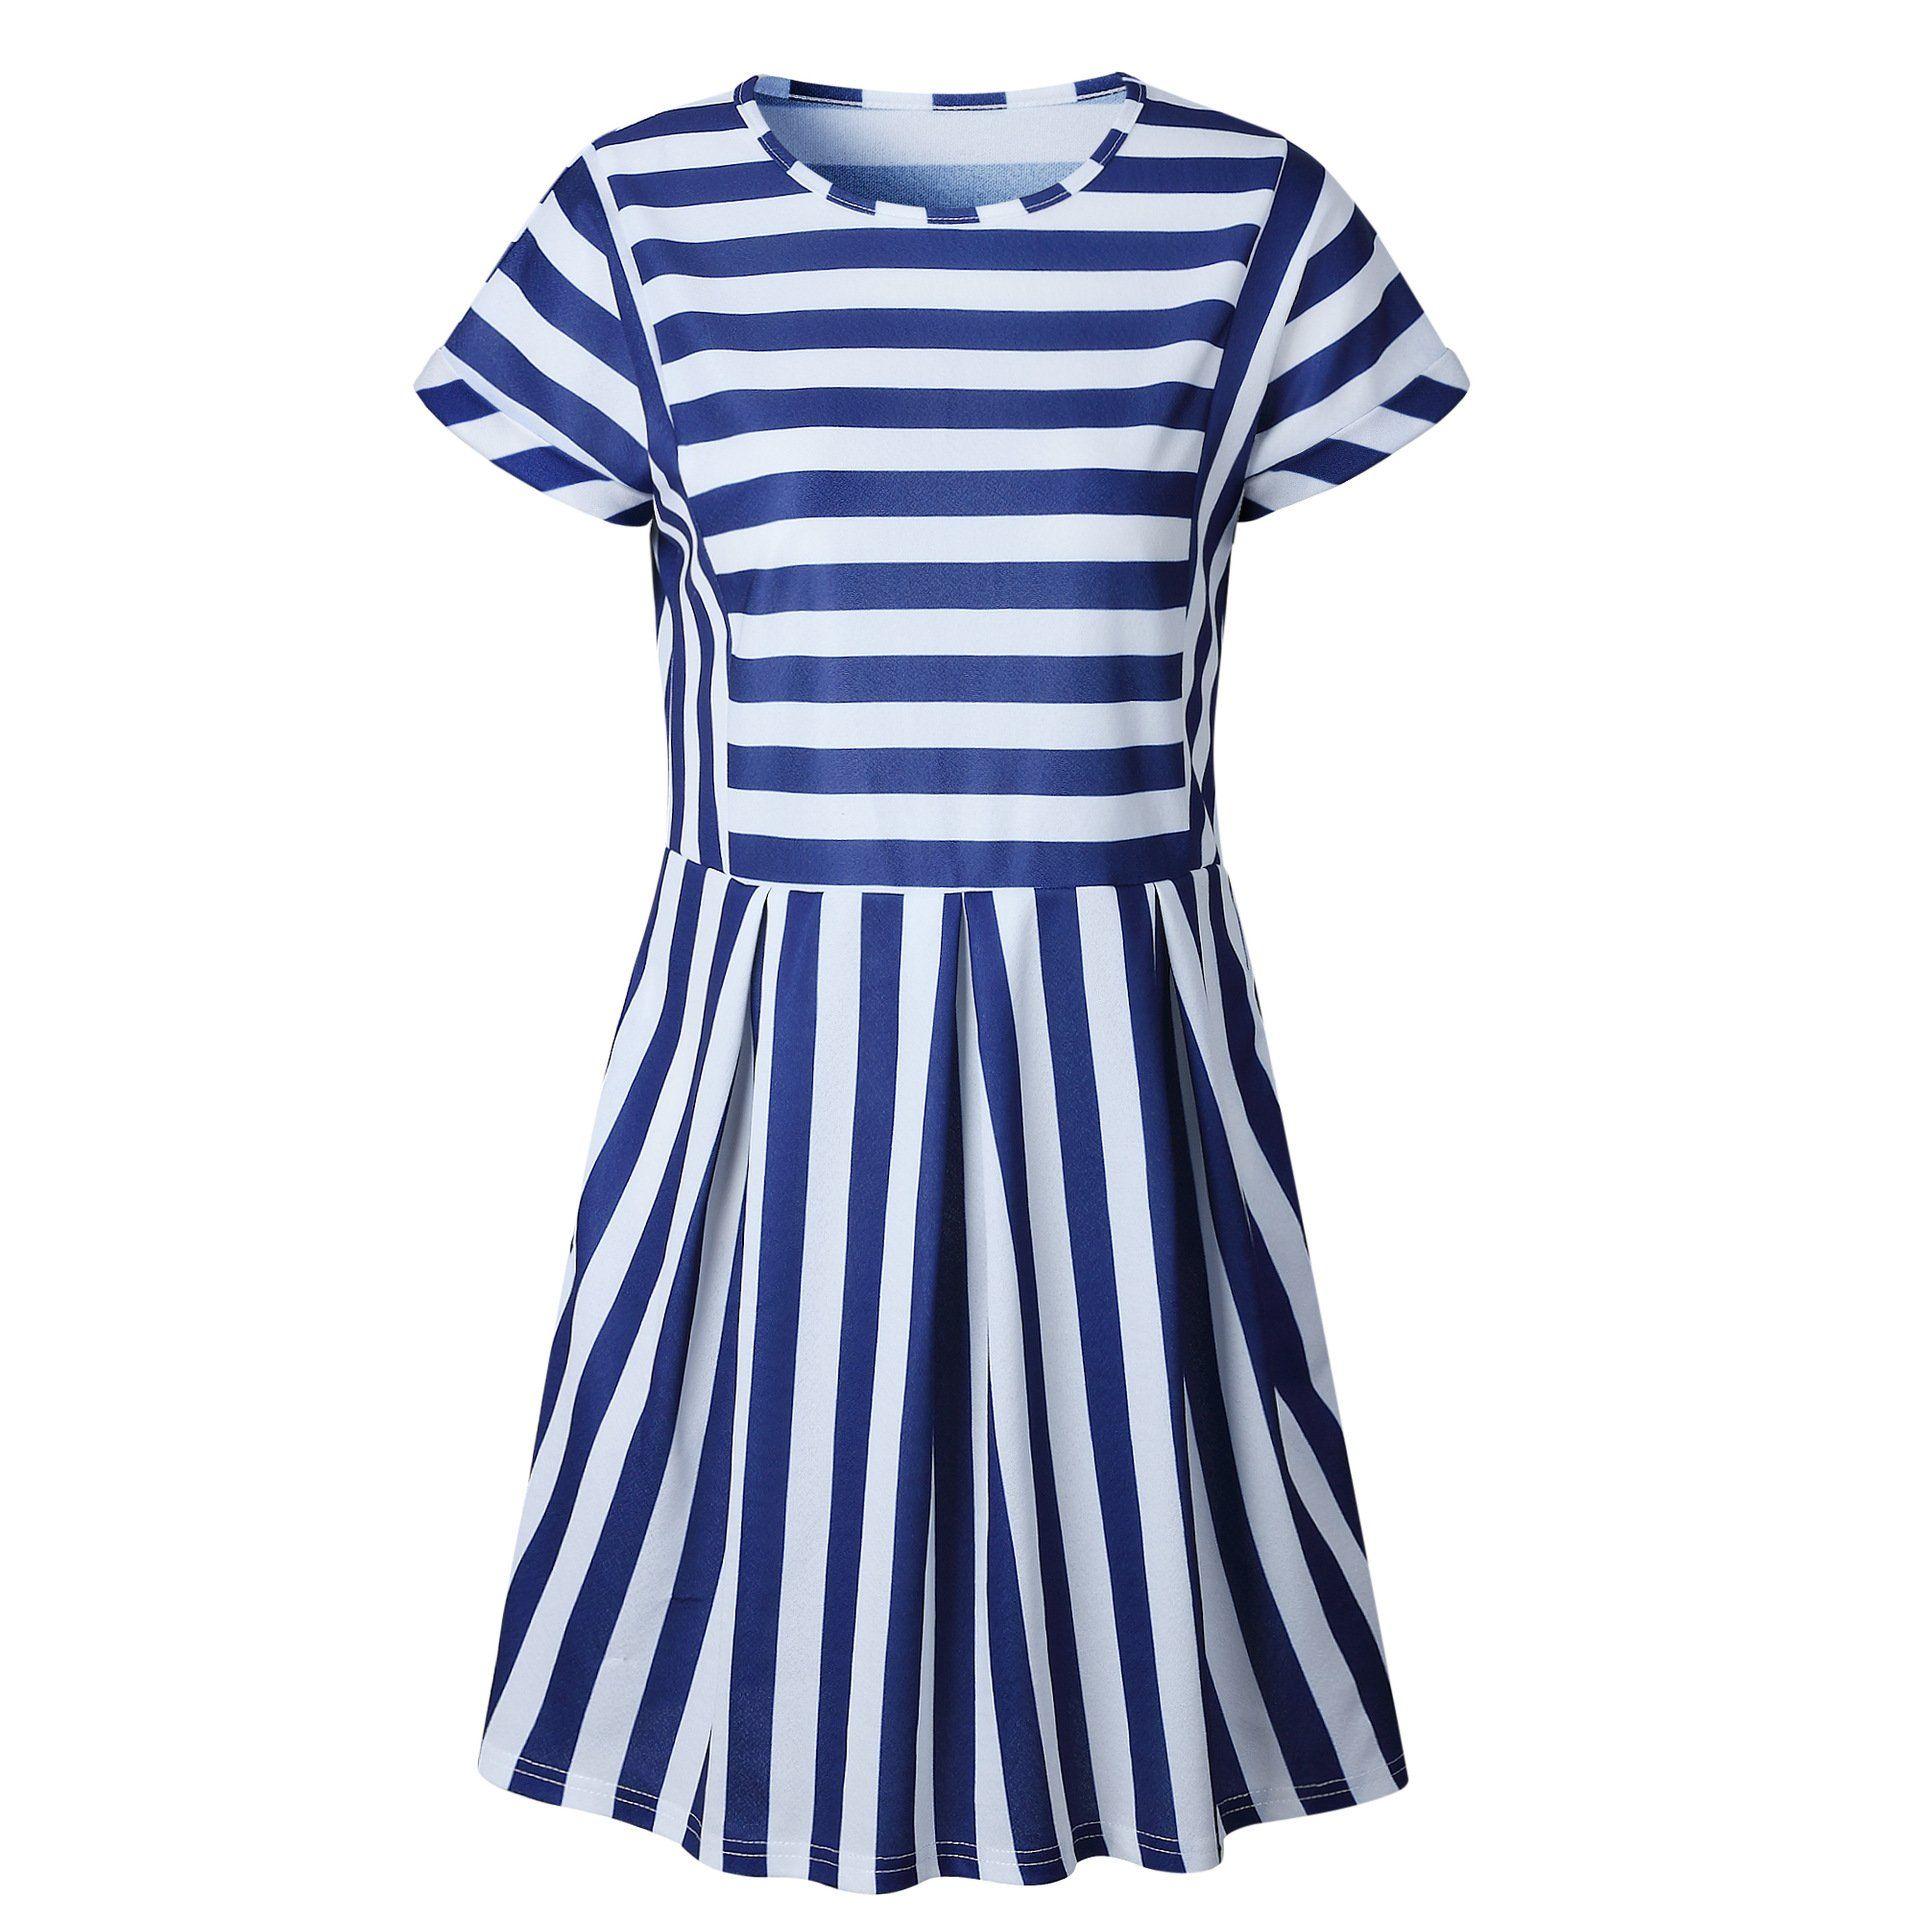 Stripe Casual Dress In 2021 Striped Casual Dresses Short Sleeve Mini Dress Sleeved Swing Dress [ 1920 x 1920 Pixel ]